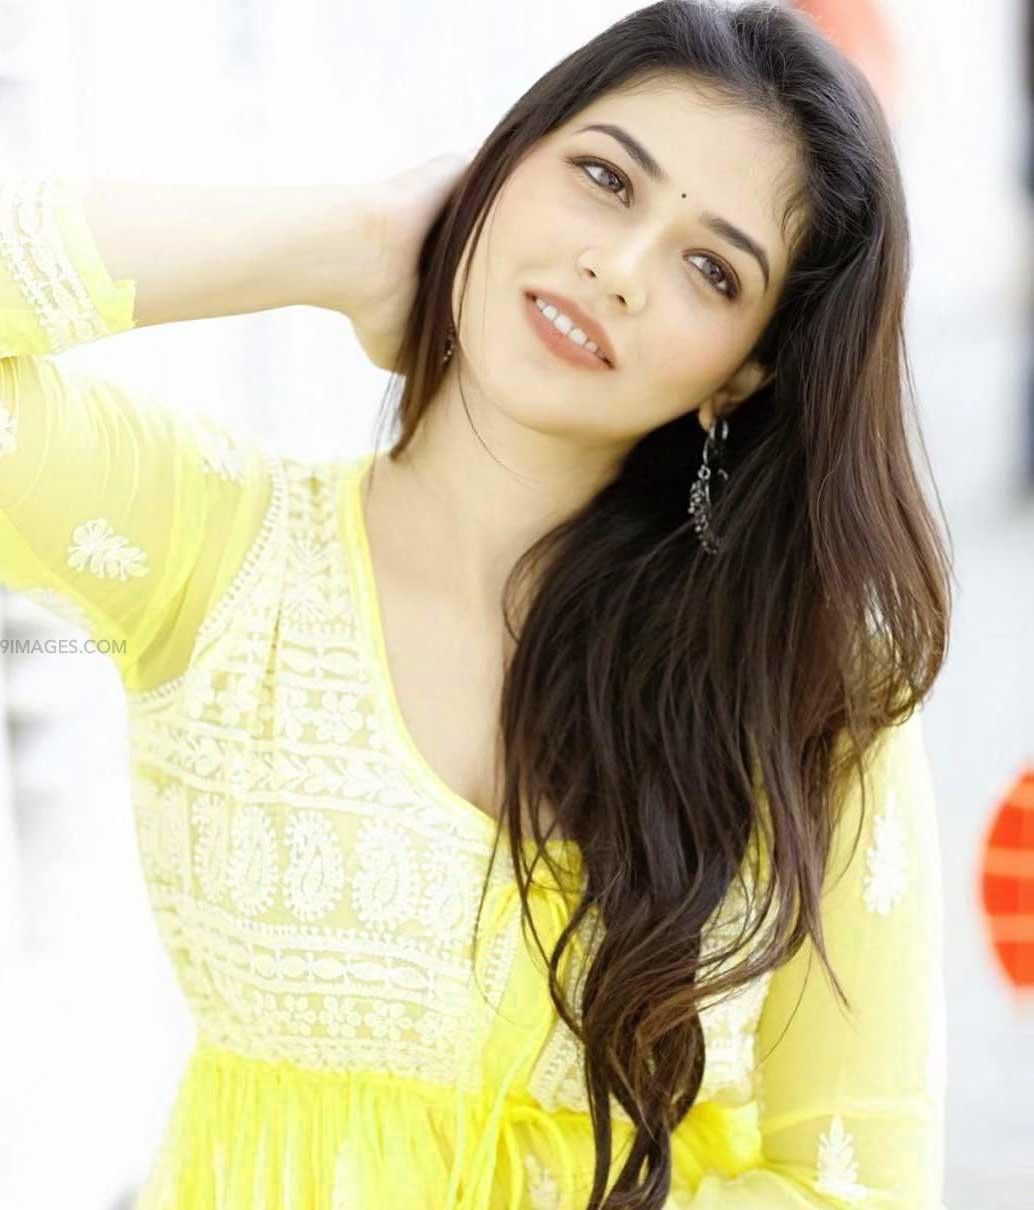 Free indian beautiful girl images Wallpaper